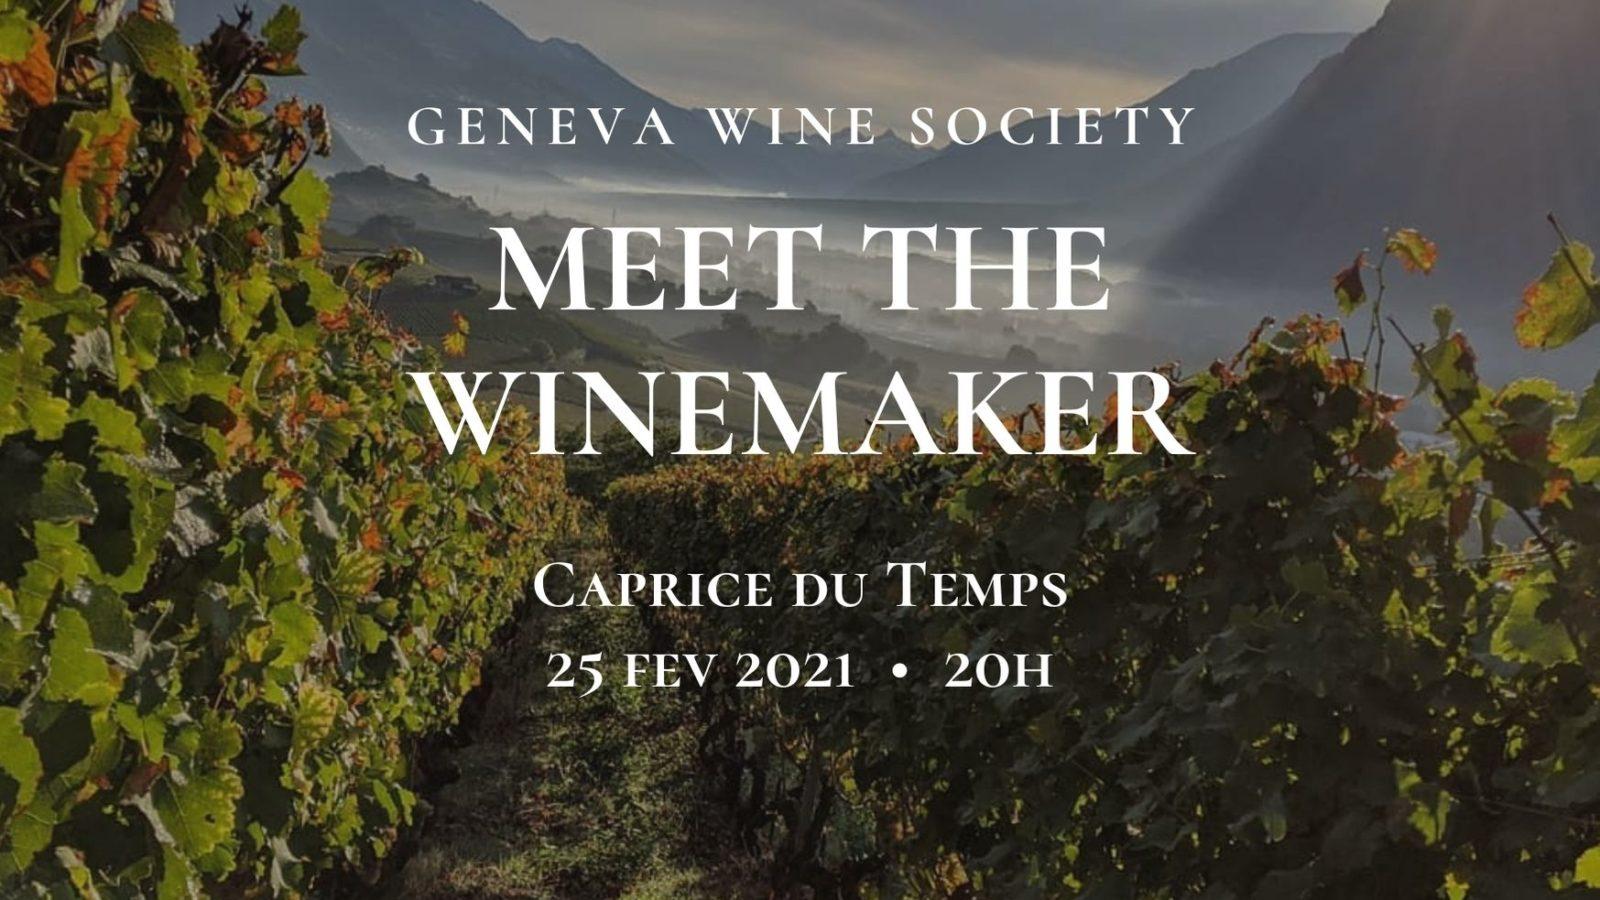 Geneva Wine Society. Meet the Winemaker series